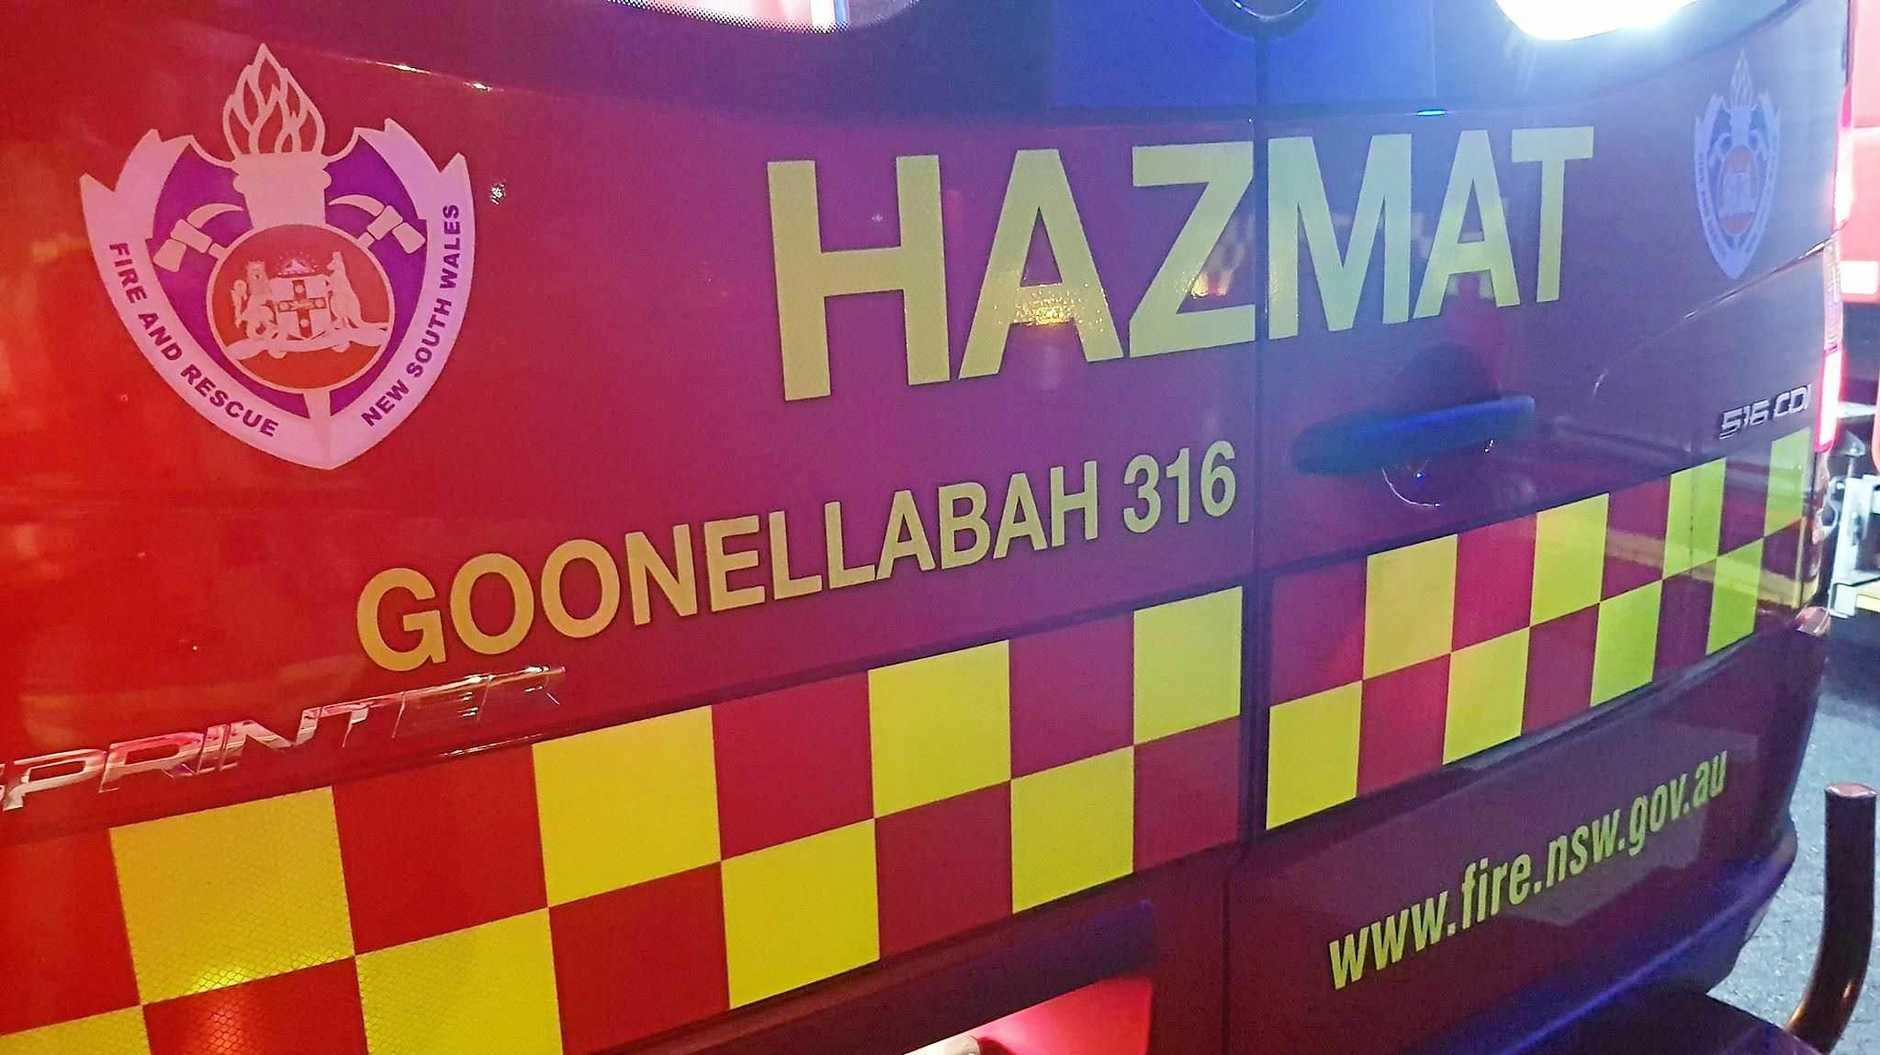 The Goonellabah Hazmat unit.